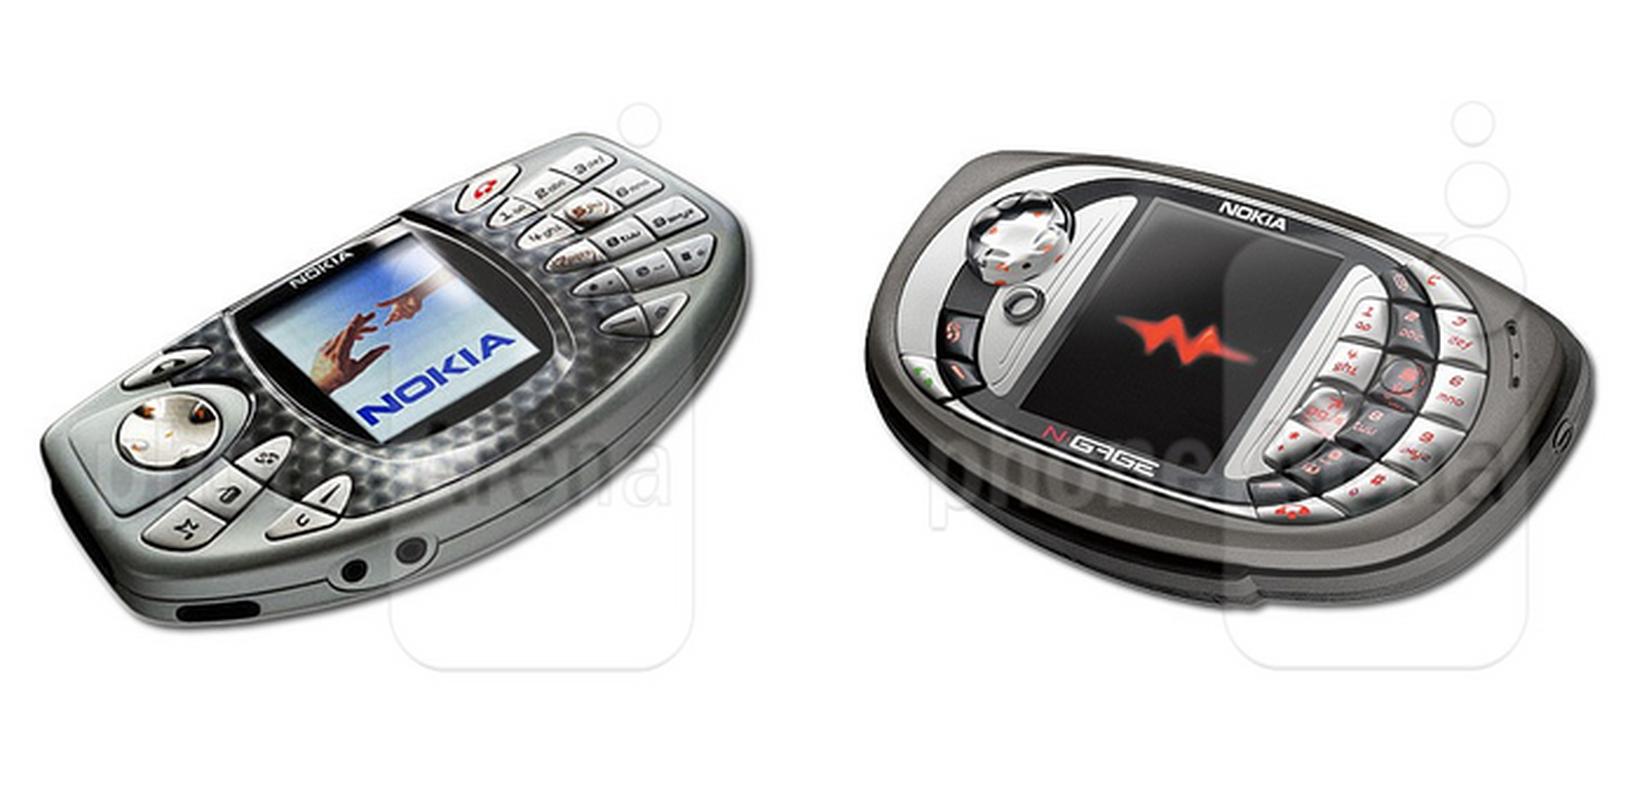 Nhung chiec dien thoai cua Nokia tung khuay dao thi truong-Hinh-4